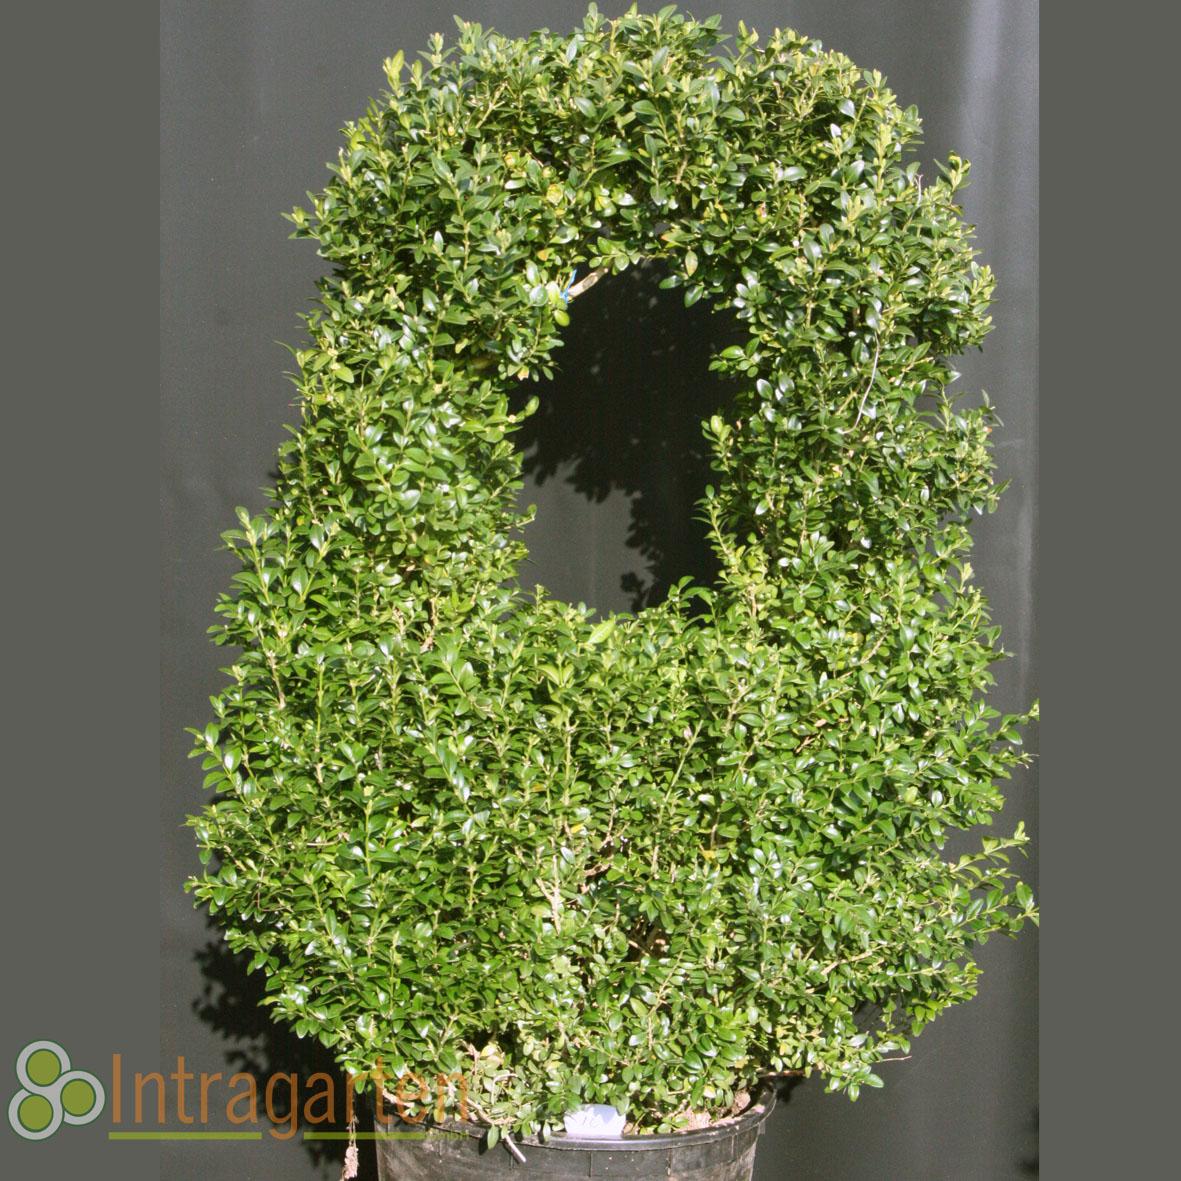 formschnitt buchsbaum ponpon korb bonsai 95 cm 10 ebay. Black Bedroom Furniture Sets. Home Design Ideas